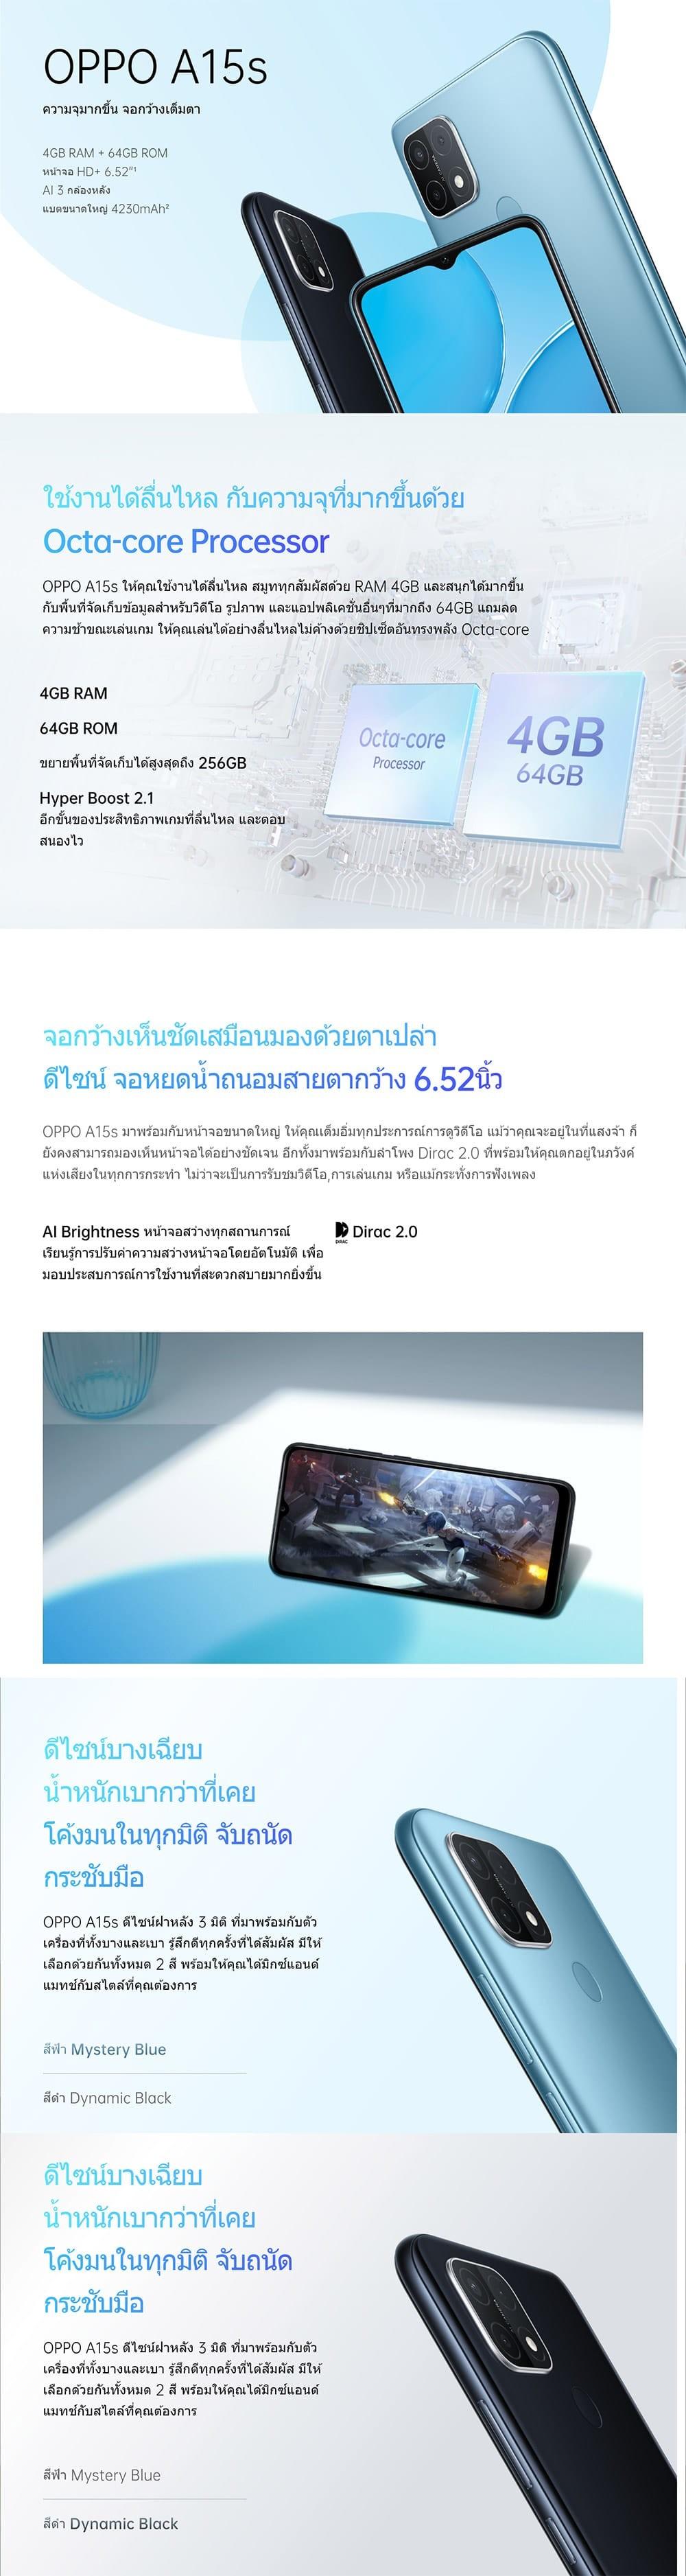 01-3000089899-feature-1.jpg